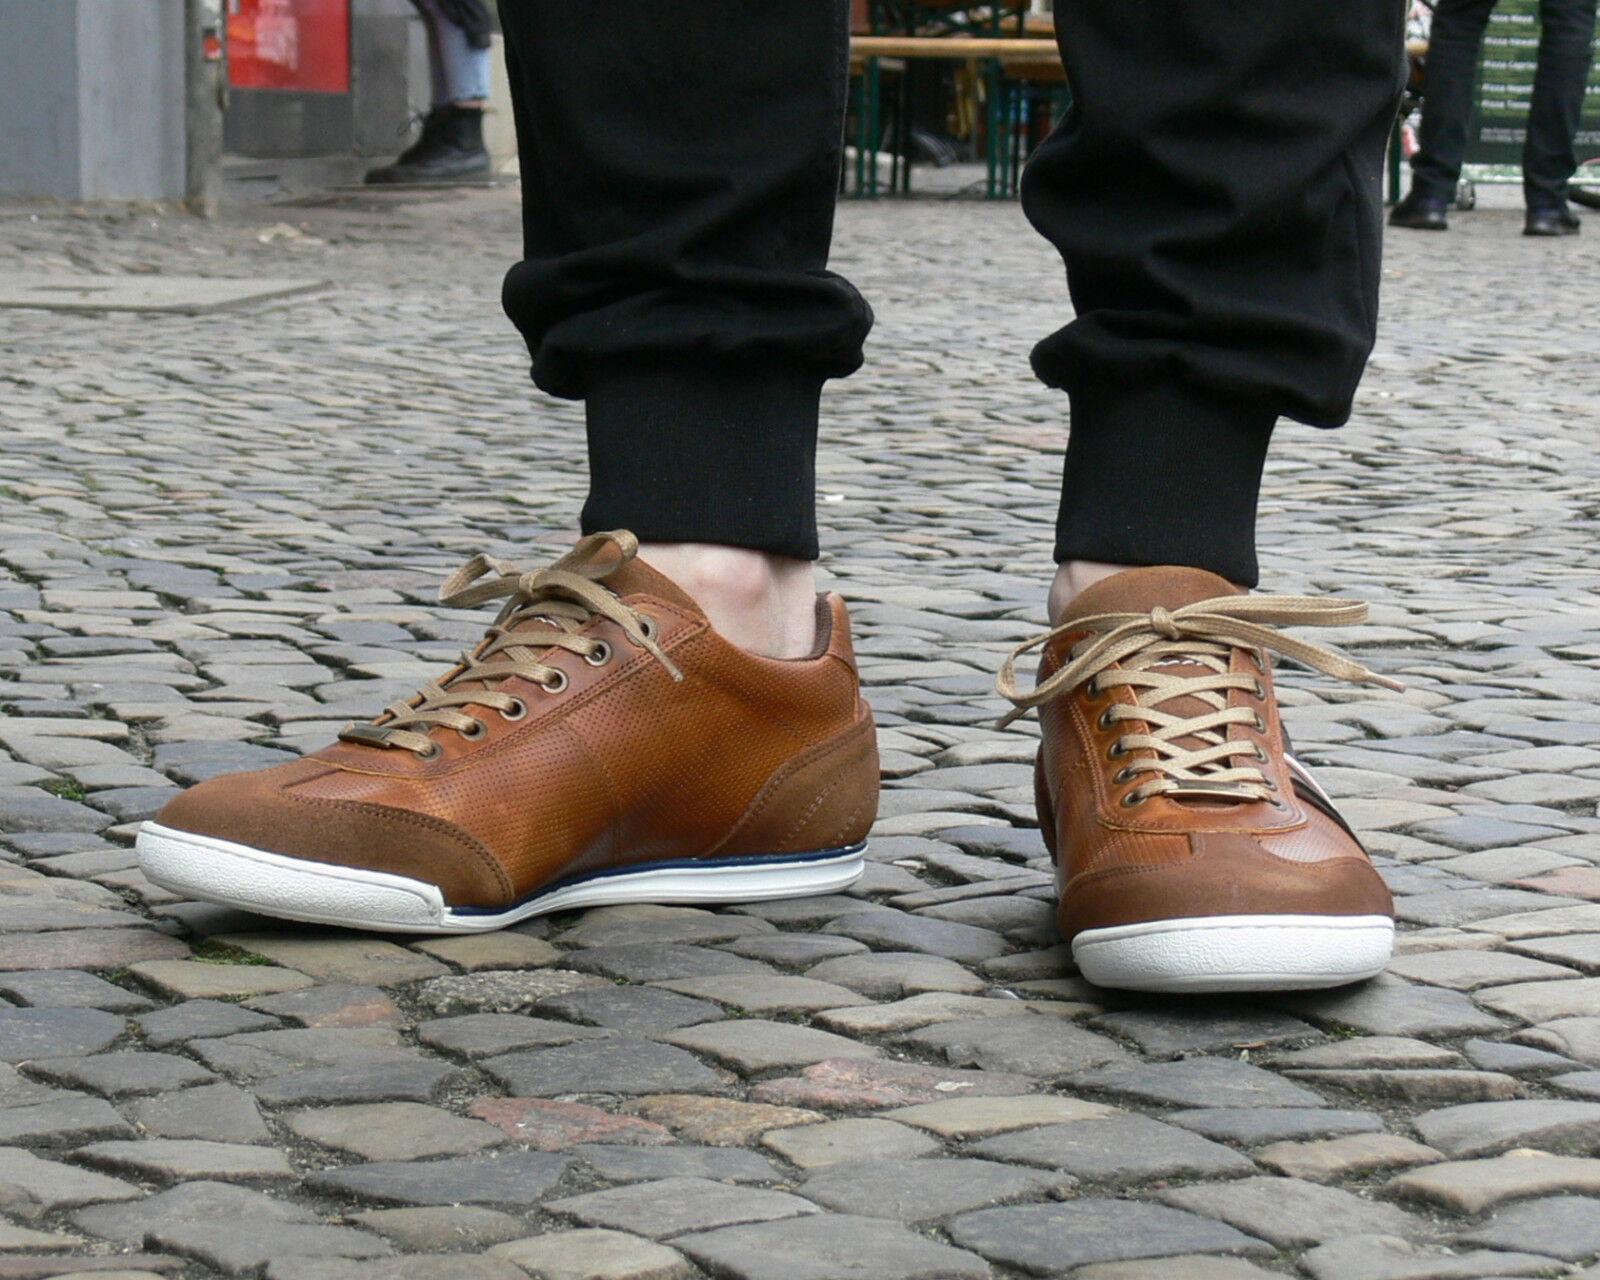 BULLBOXER Schnürschuh 27 braun 531 Echtleder Halbschuh Herrenschuh Sneaker neu